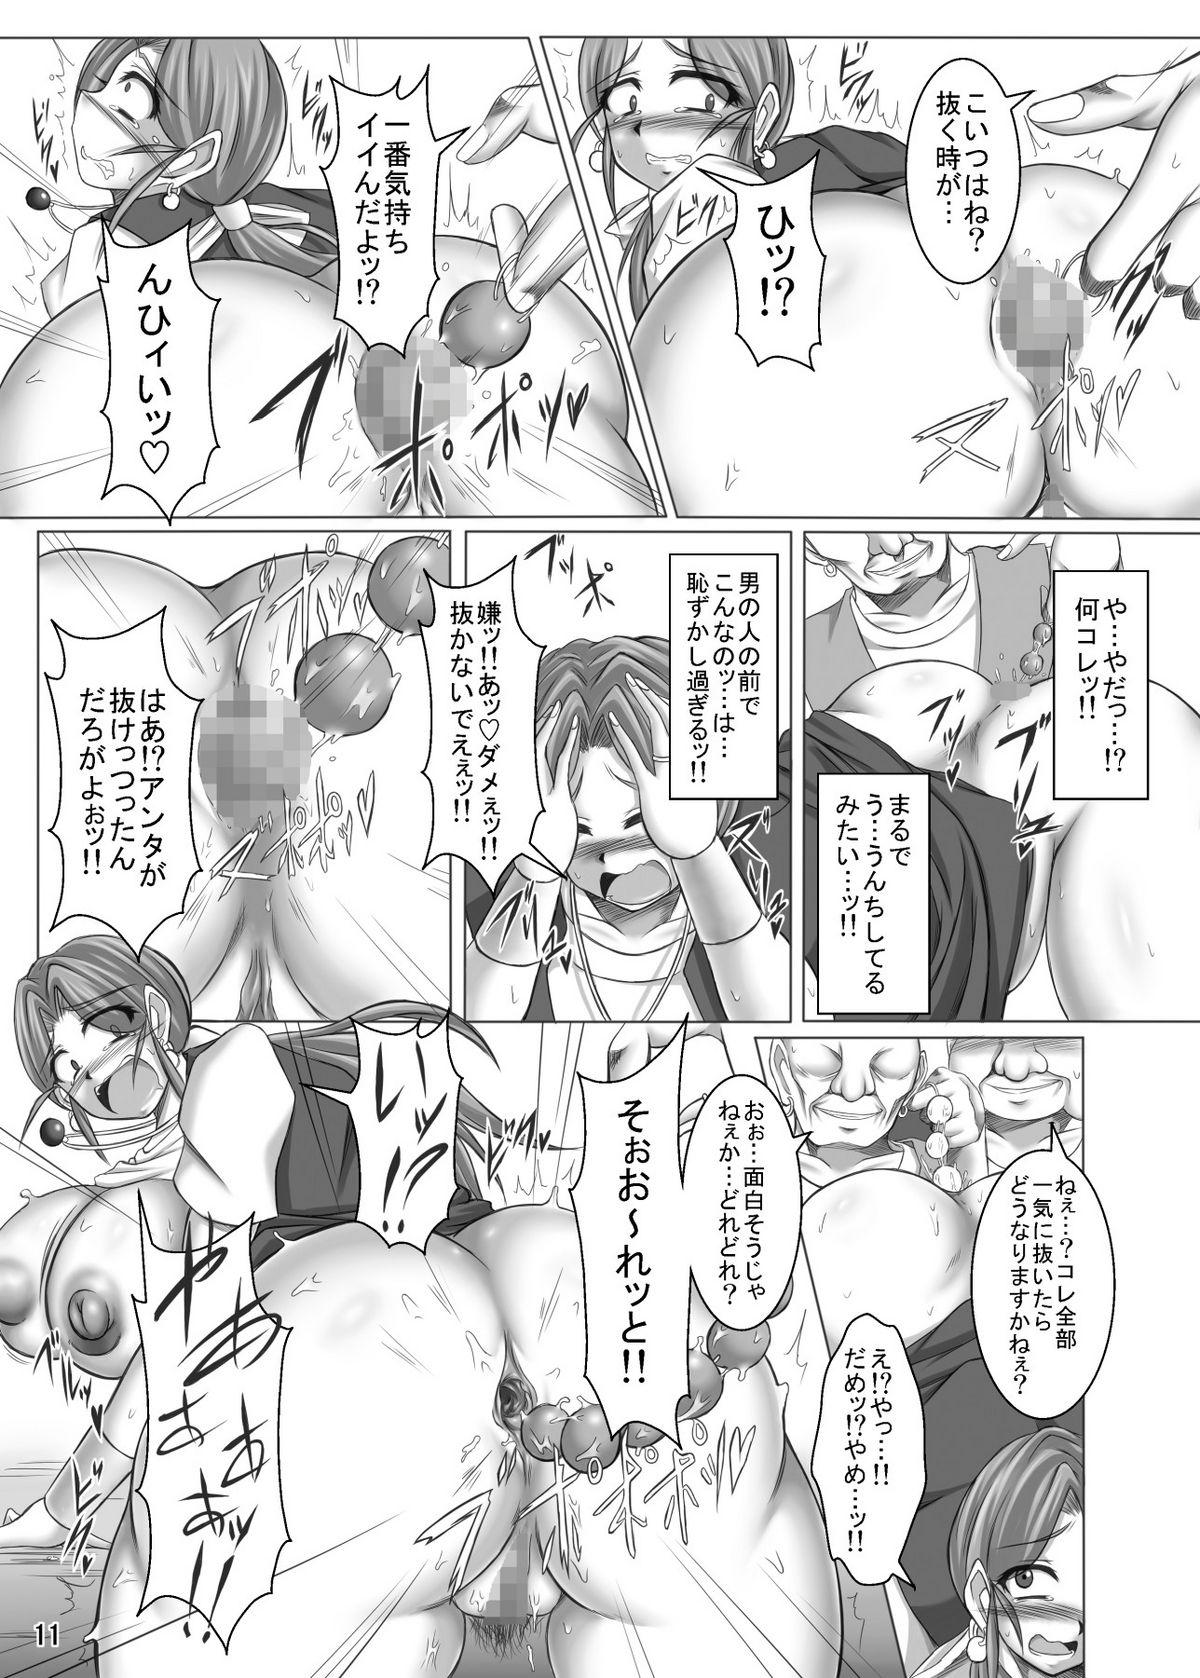 (COMIC1☆4) [Pint Size (Yakusho)] Toruneko Fujin Nene(36) Inran Bakunyu Mesuduma Manya Soe (Dragon Quest IV) 10